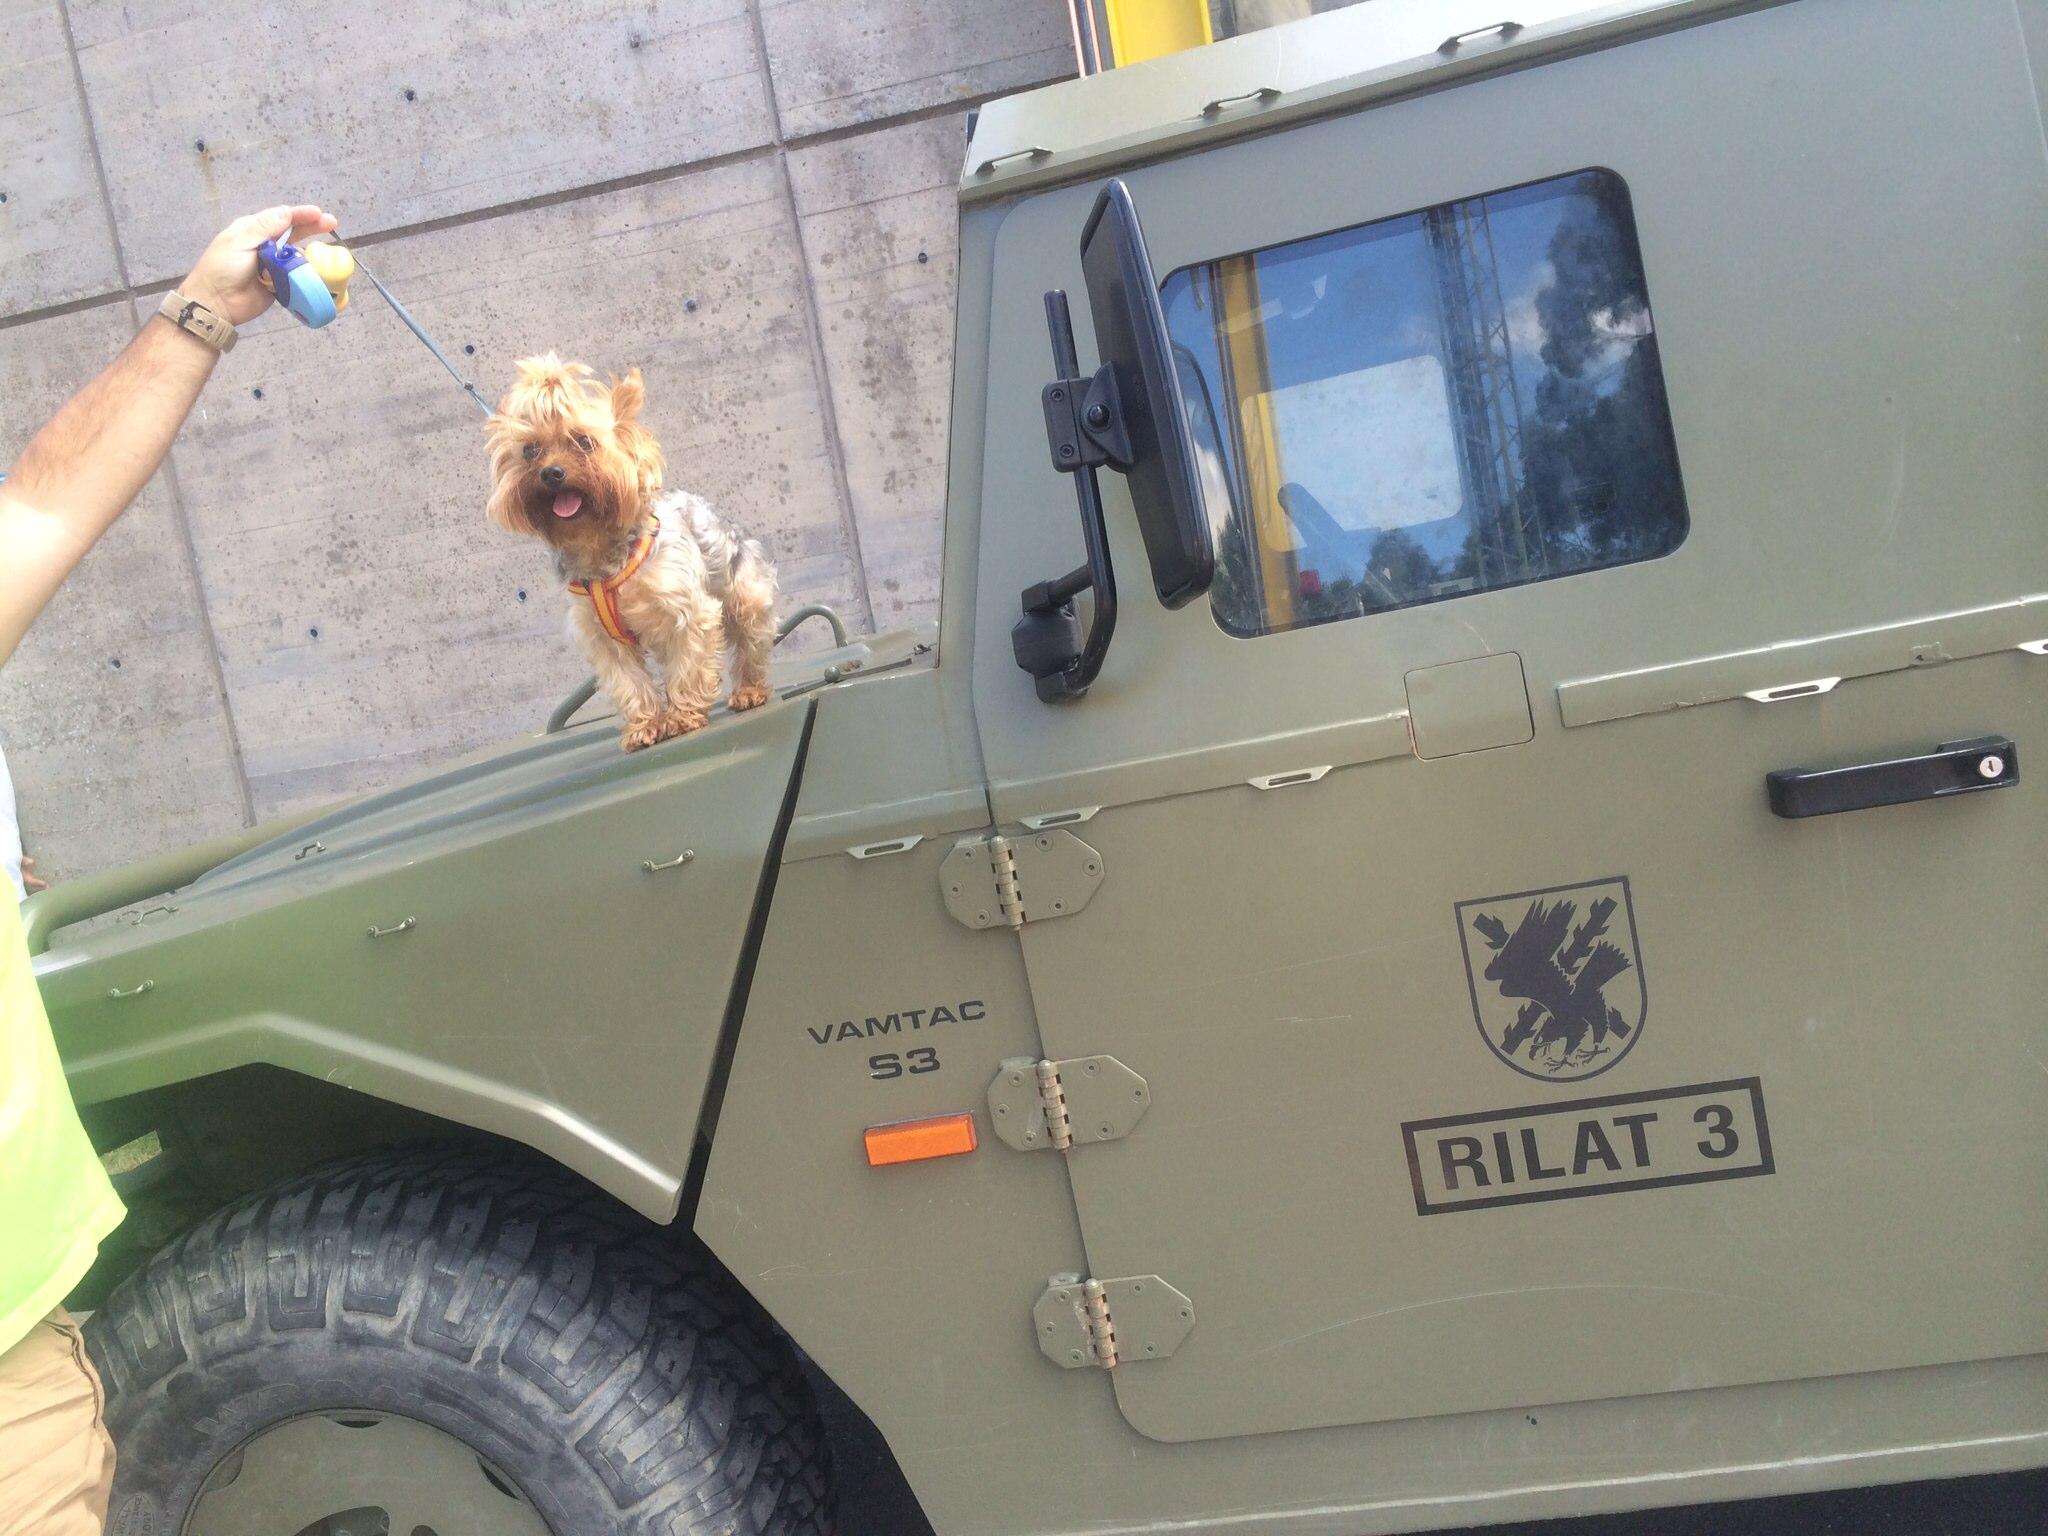 Aquí Mateo subido en un vehículo militar VAMTAC de @laBRILAT